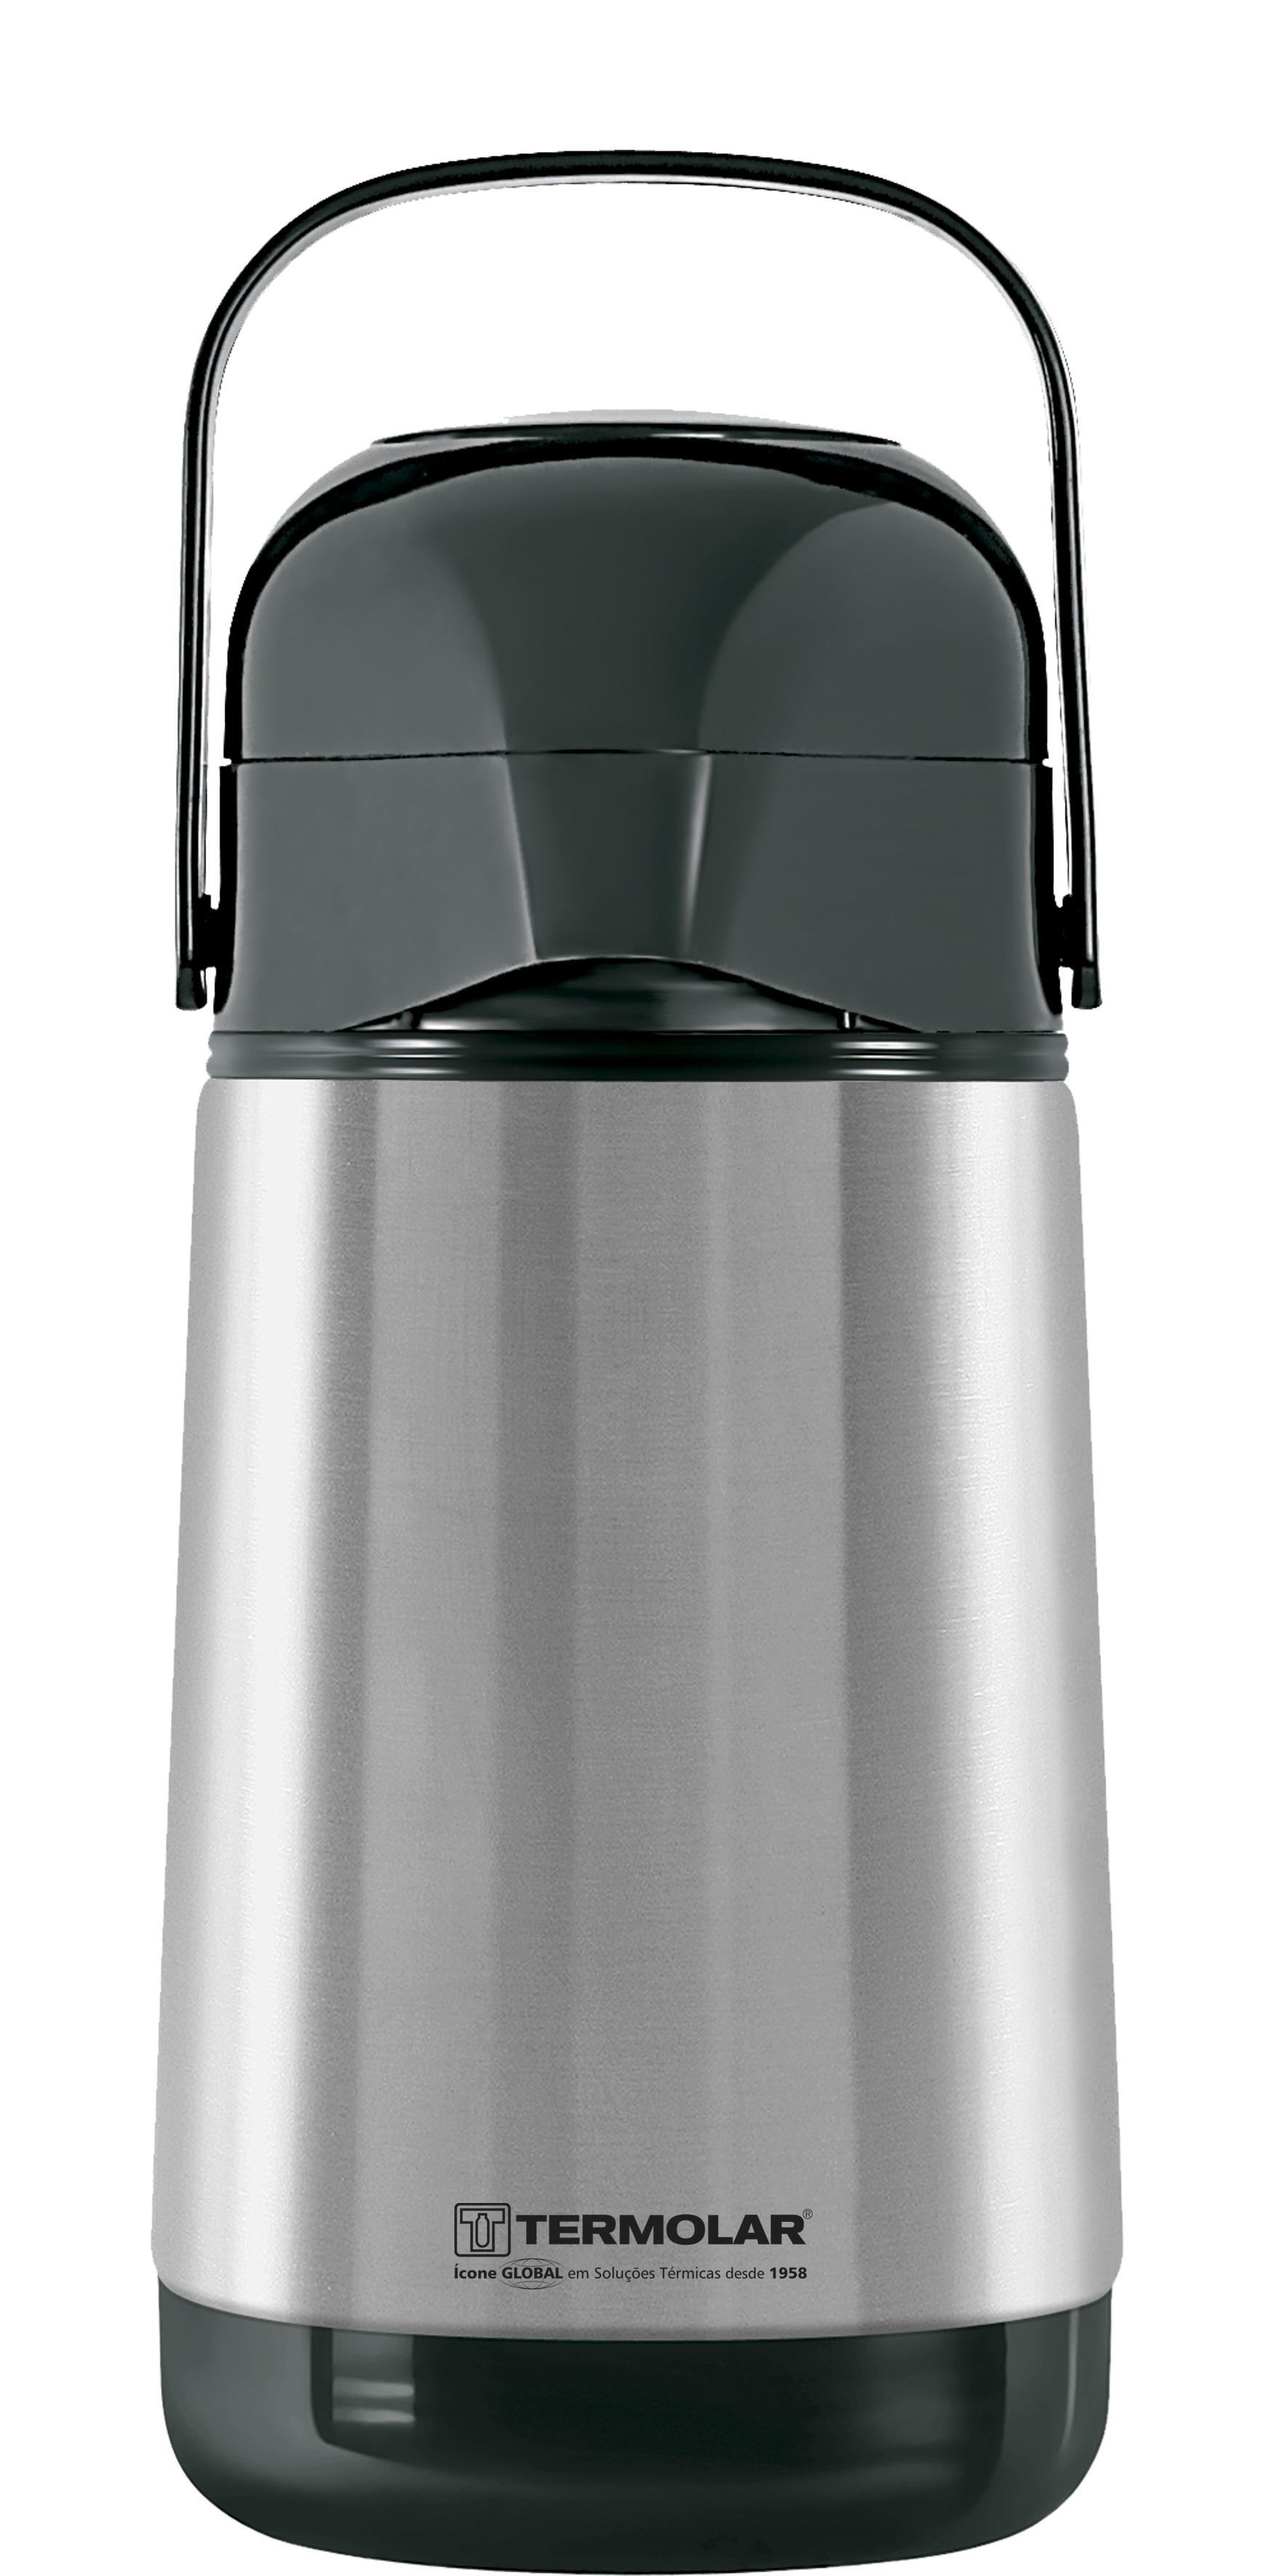 Garrafa Térmica Lúmina 0,5 litros INOX - TERMOLAR